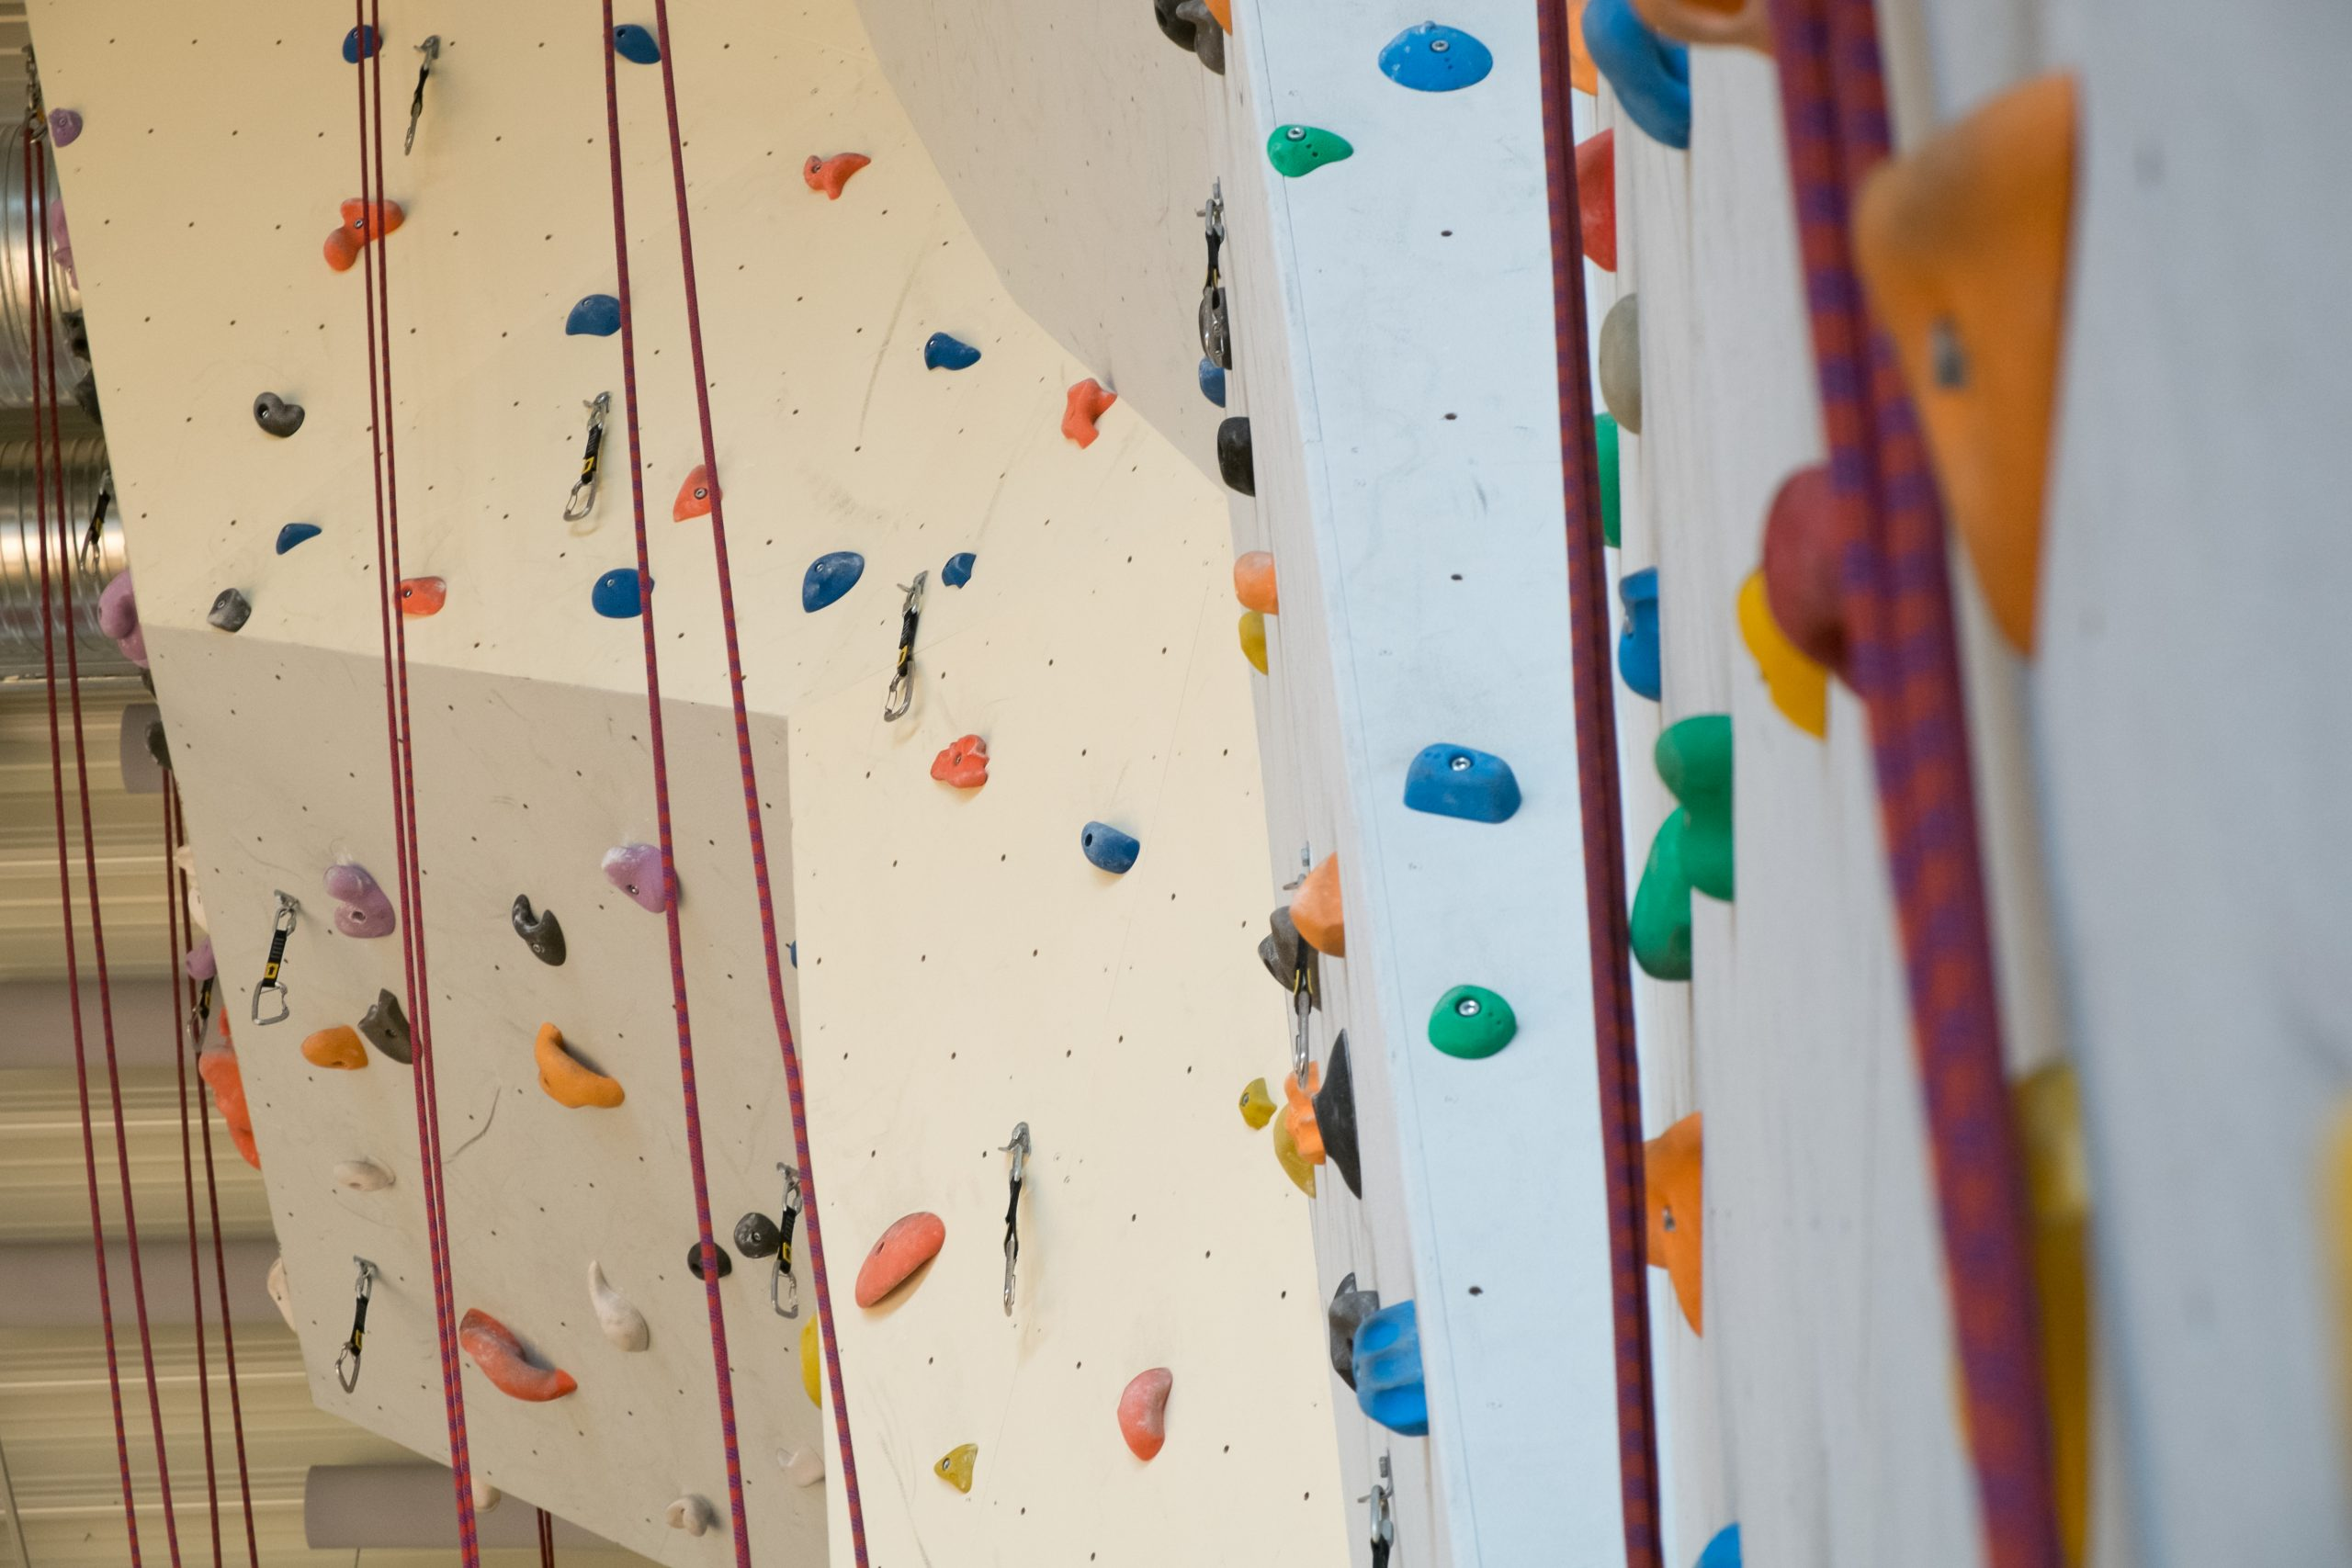 Indoor Rock Wall